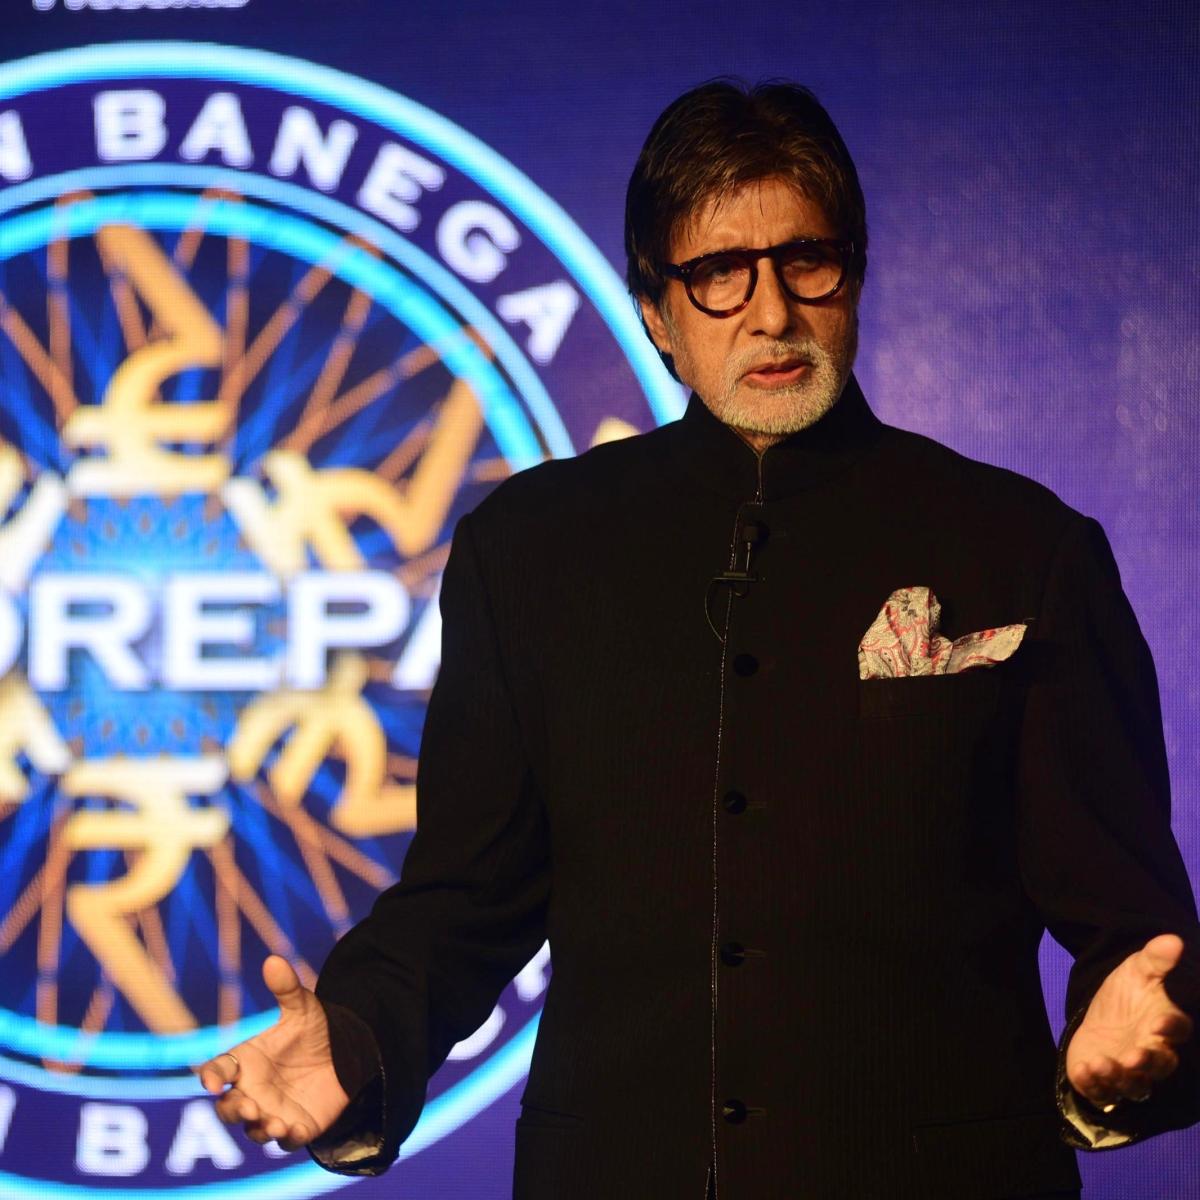 Amitabh Bachchan starts shooting for 'Kaun Banega Crorepati 12' amid the COVID-19 lockdown